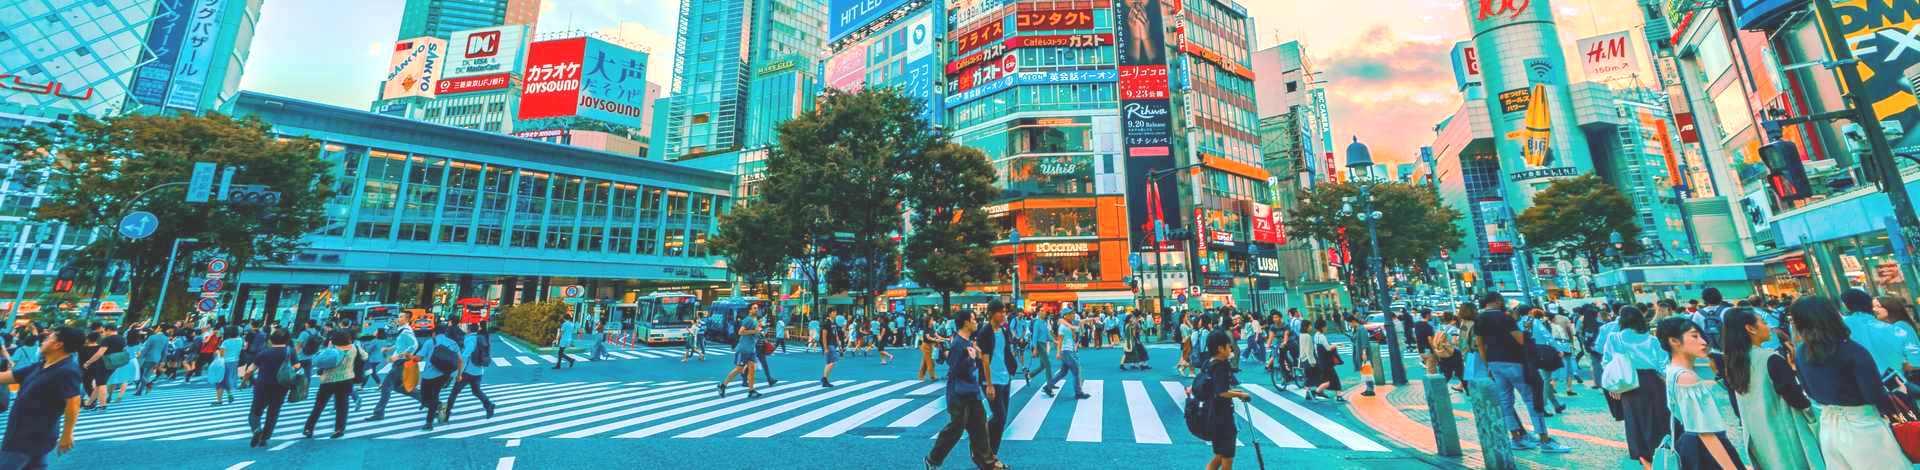 Escapade à Tokyo - Asie Online